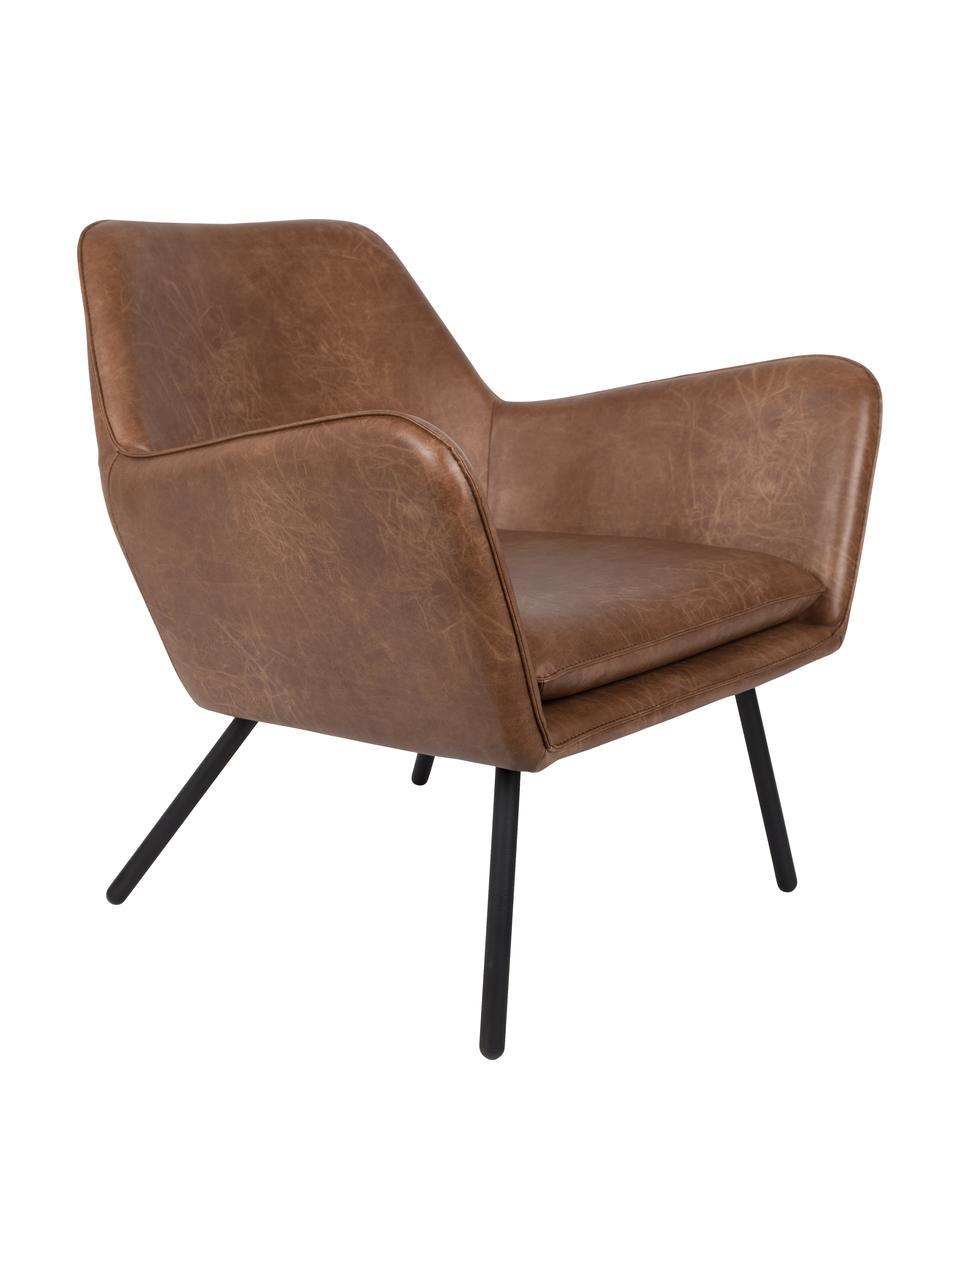 Kunstleder-Loungesessel Bon im Industrial Design, Bezug: Kunstleder (64% Polyureth, Füße: Metall, lackiert, Kunstleder Braun, B 80 x T 76 cm